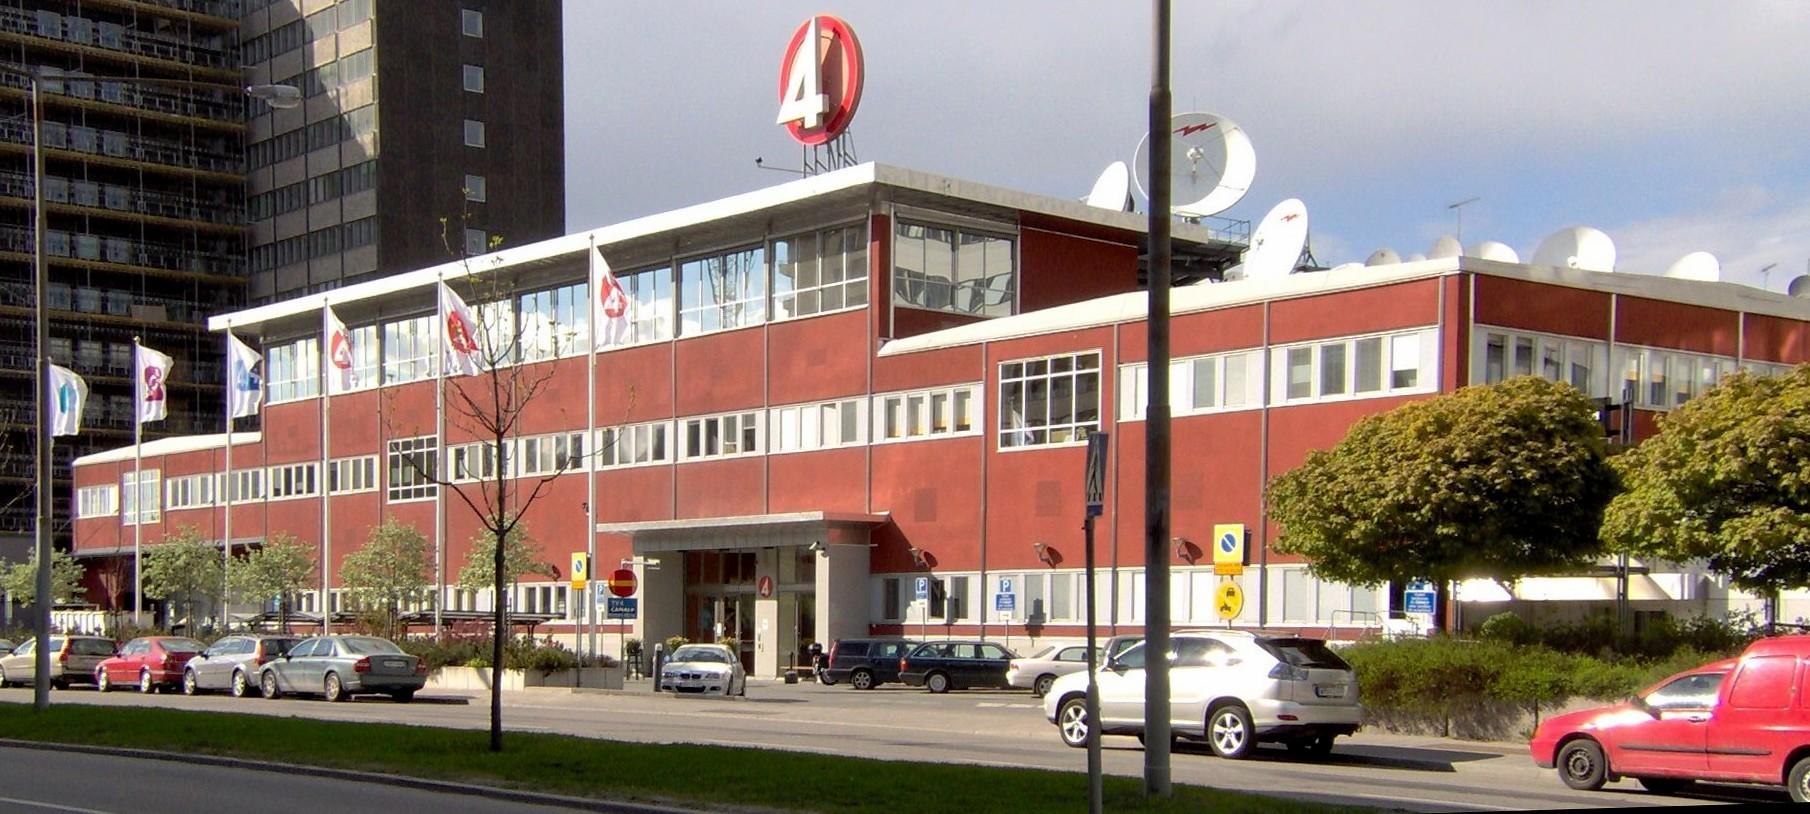 TV4-huset